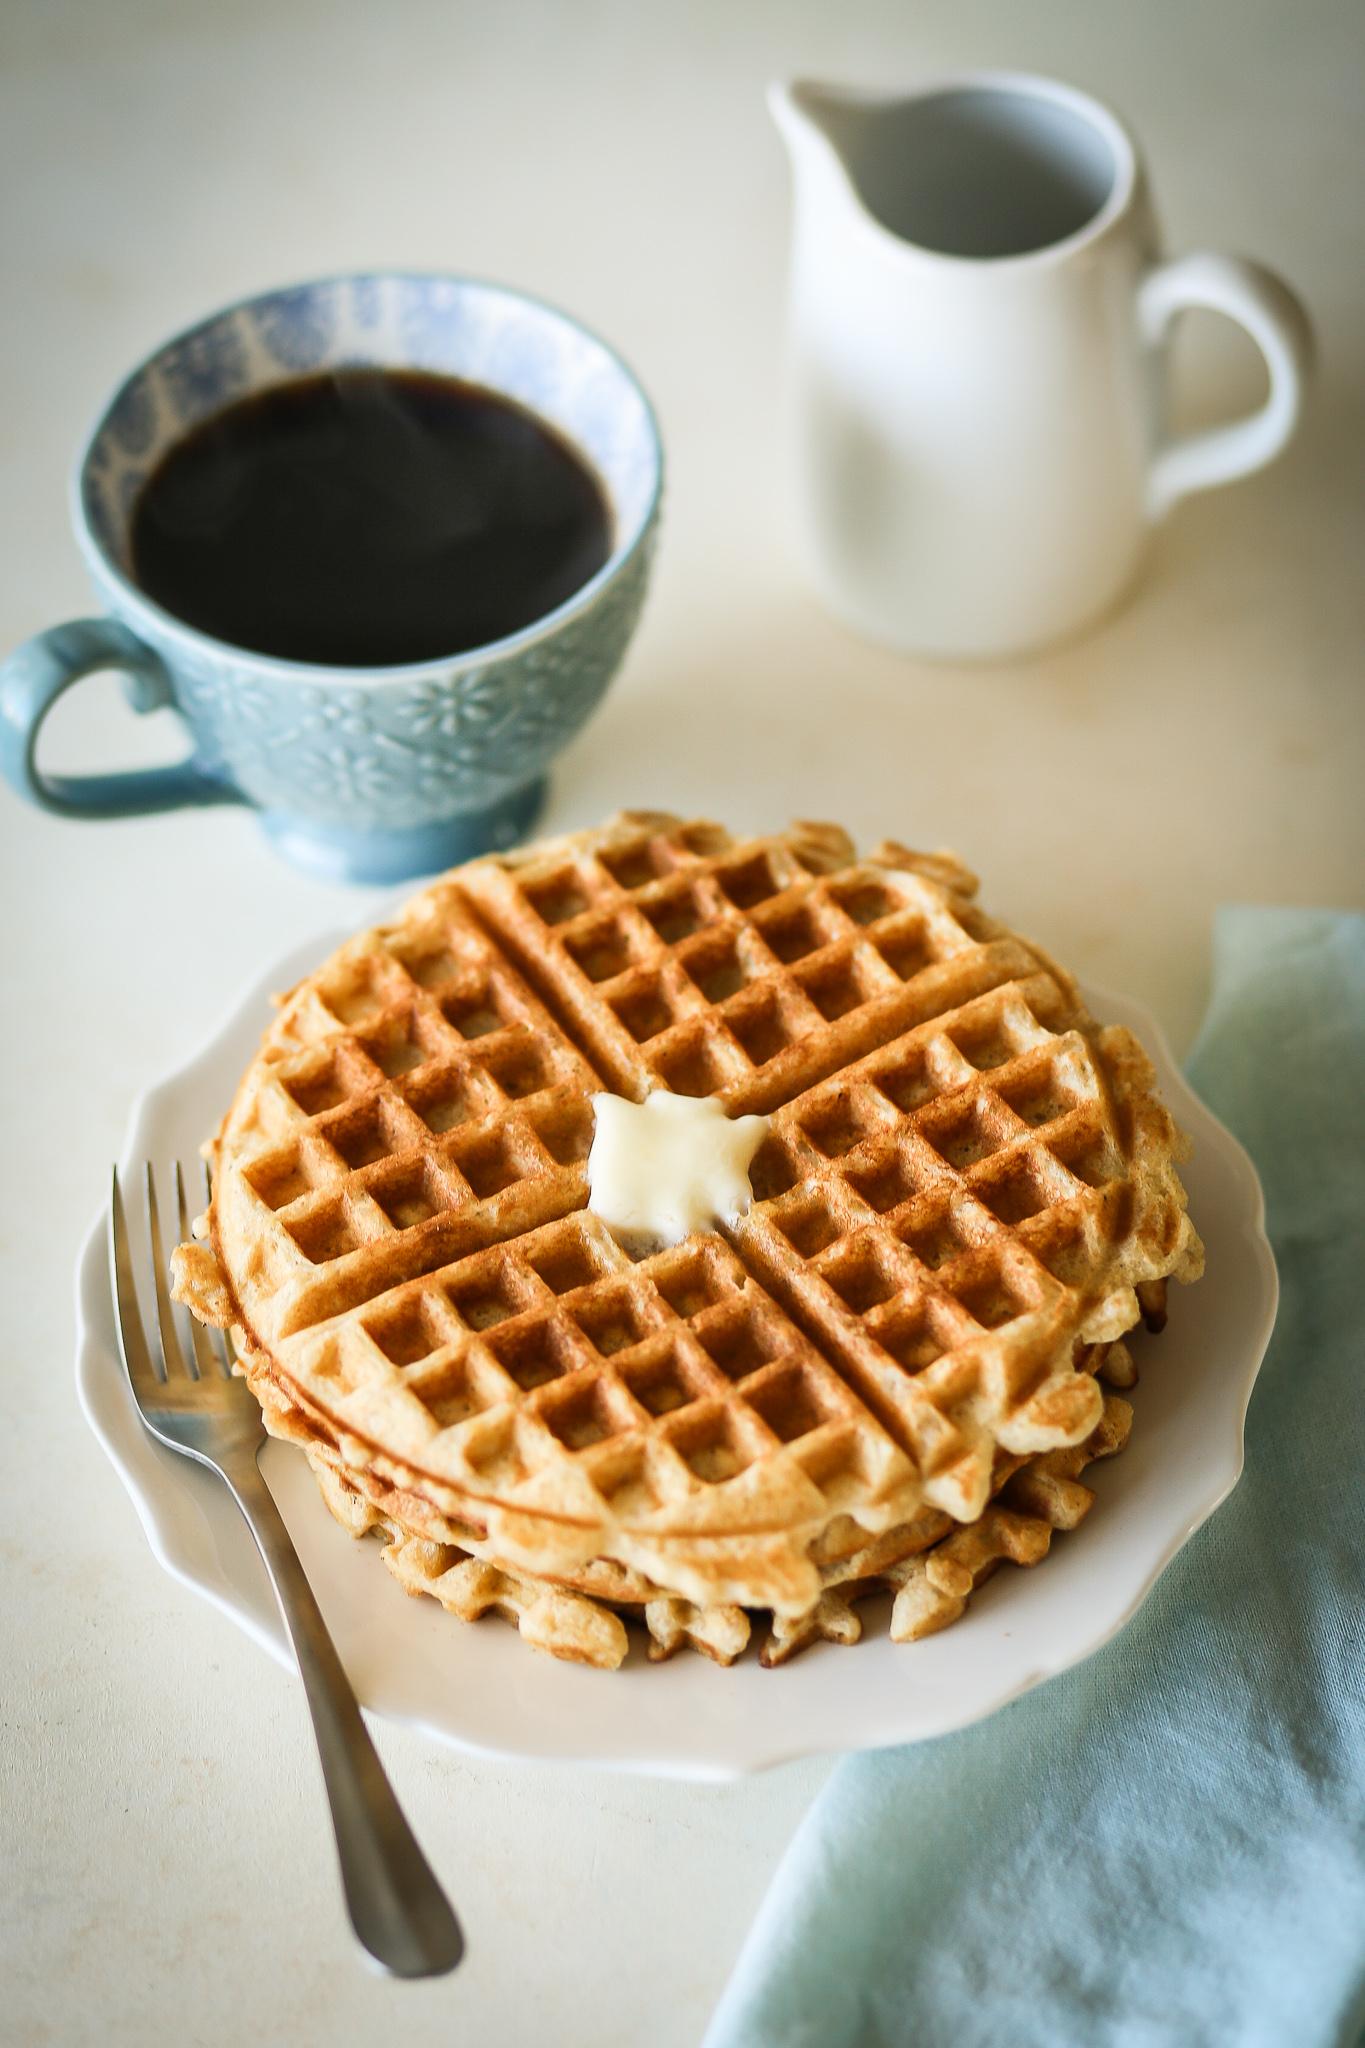 Brown Butter Vanilla Waffles | Set the Table #waffles #breakfast #recipe #wafflerecipe #brownbutter #vanilla #brunch